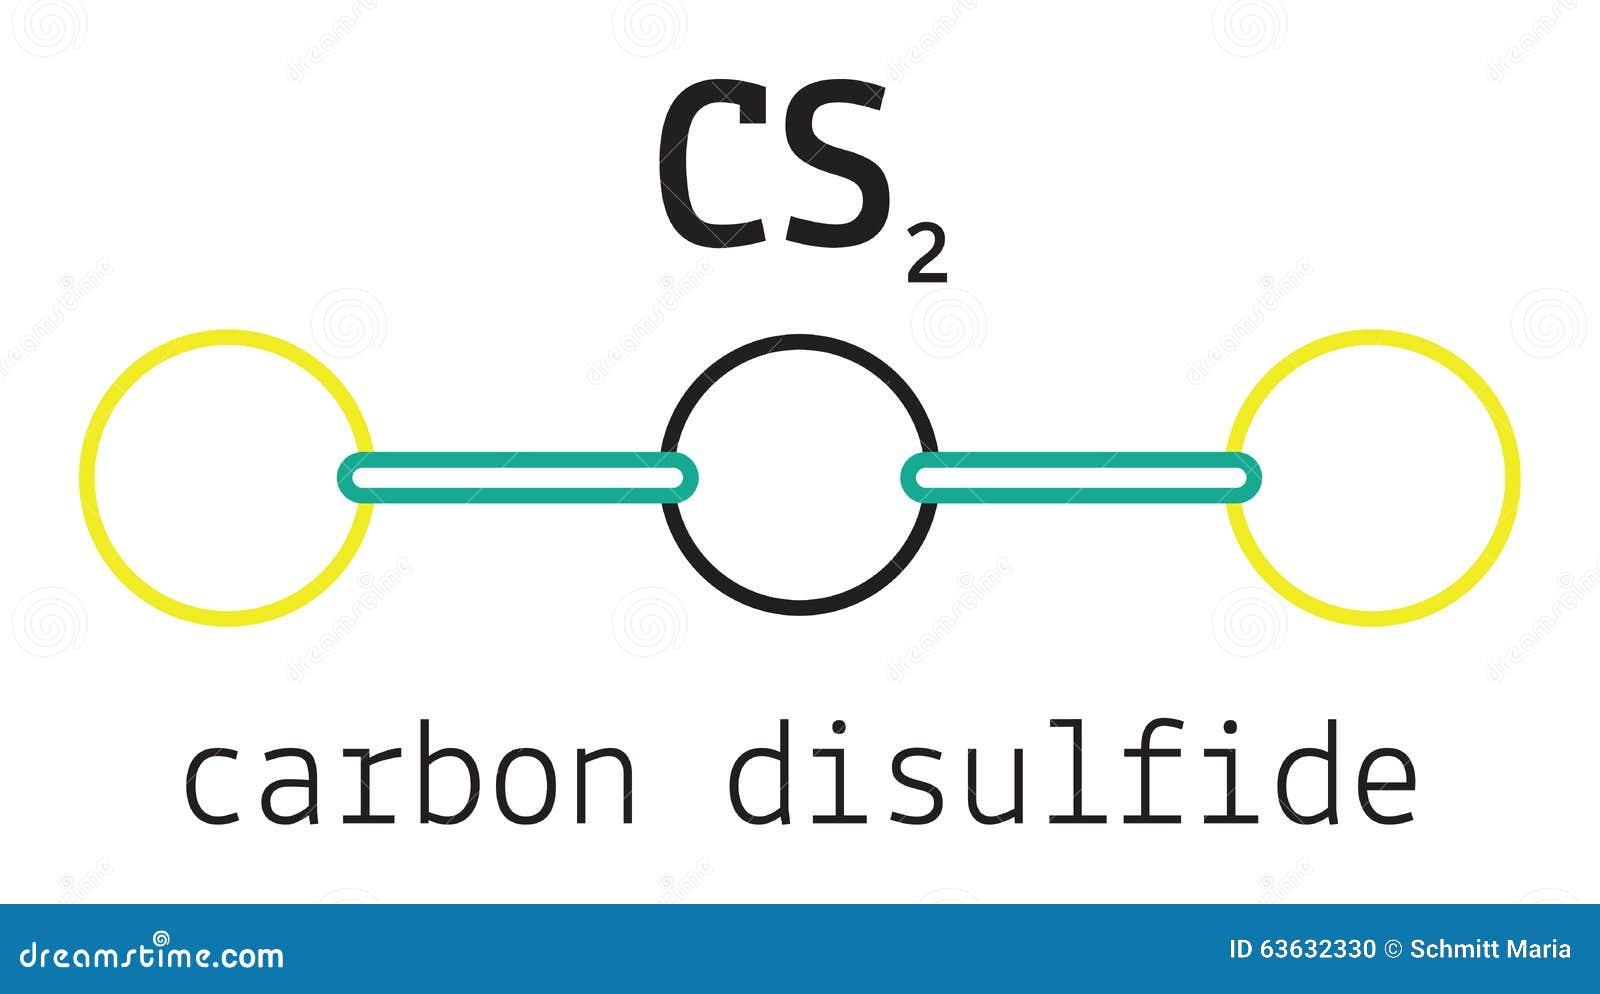 Cs2 Carbon Disulfide Molecule Stock Vector Illustration Of